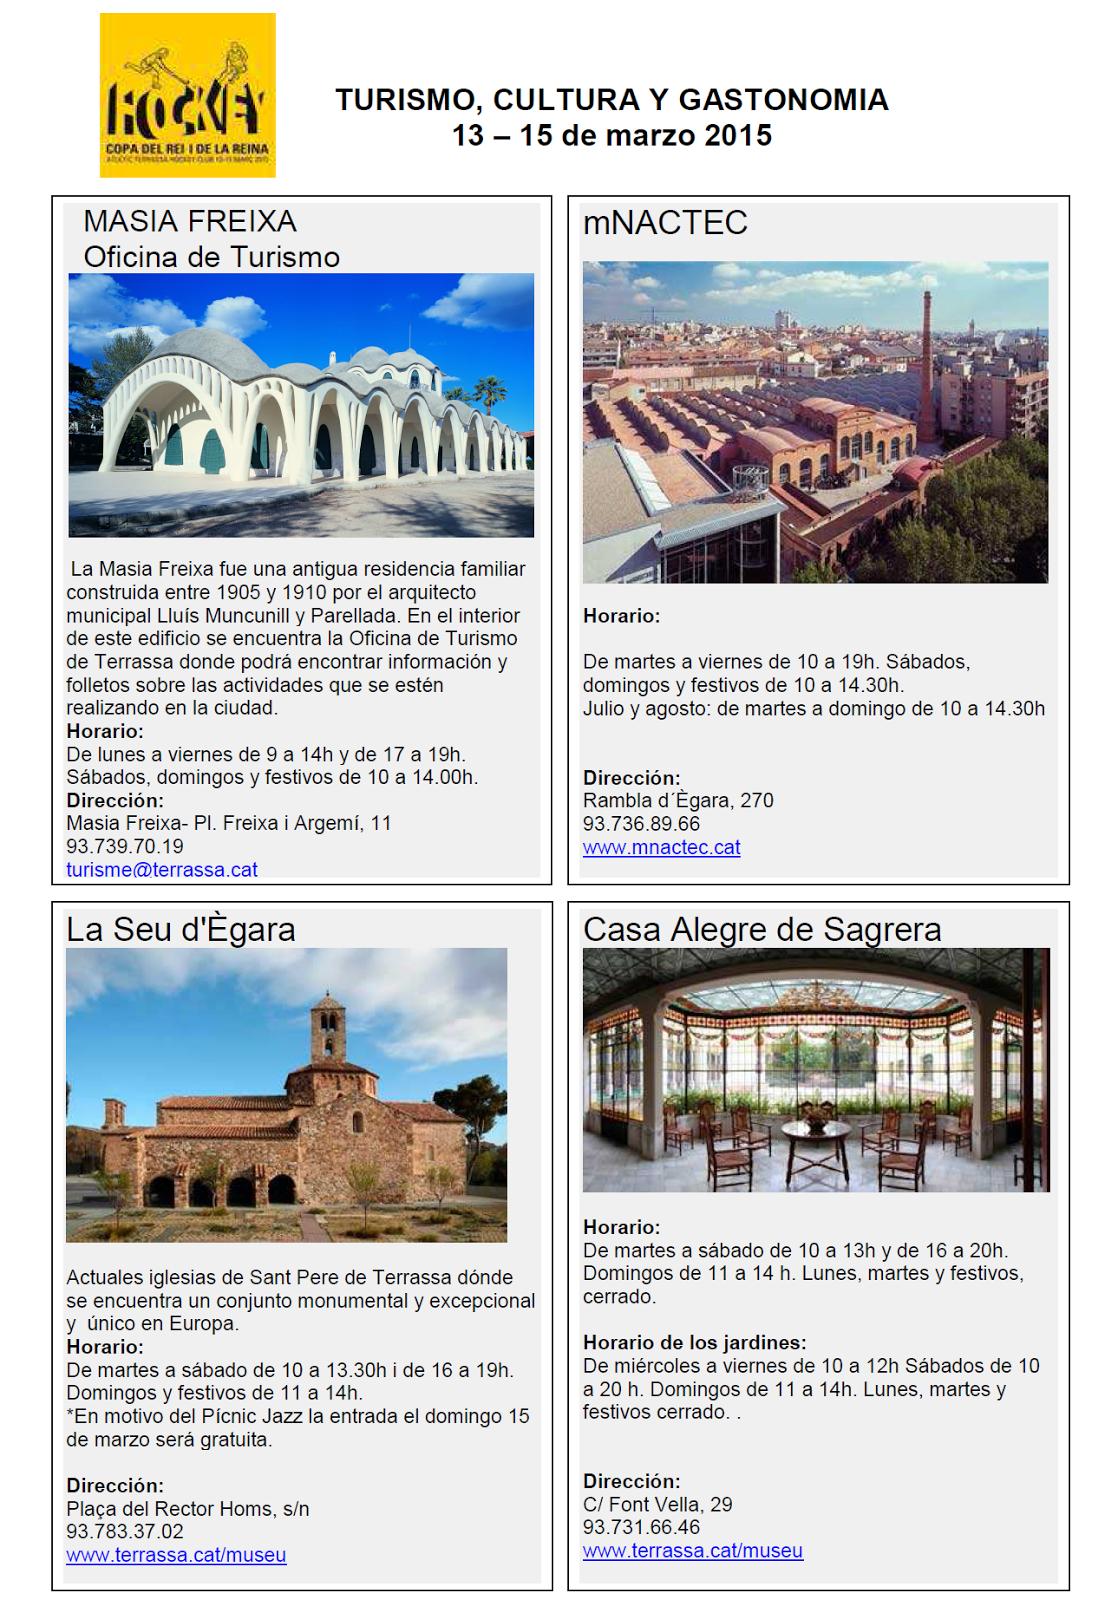 http://copasathc.blogspot.com.es/p/blog-page_10.html